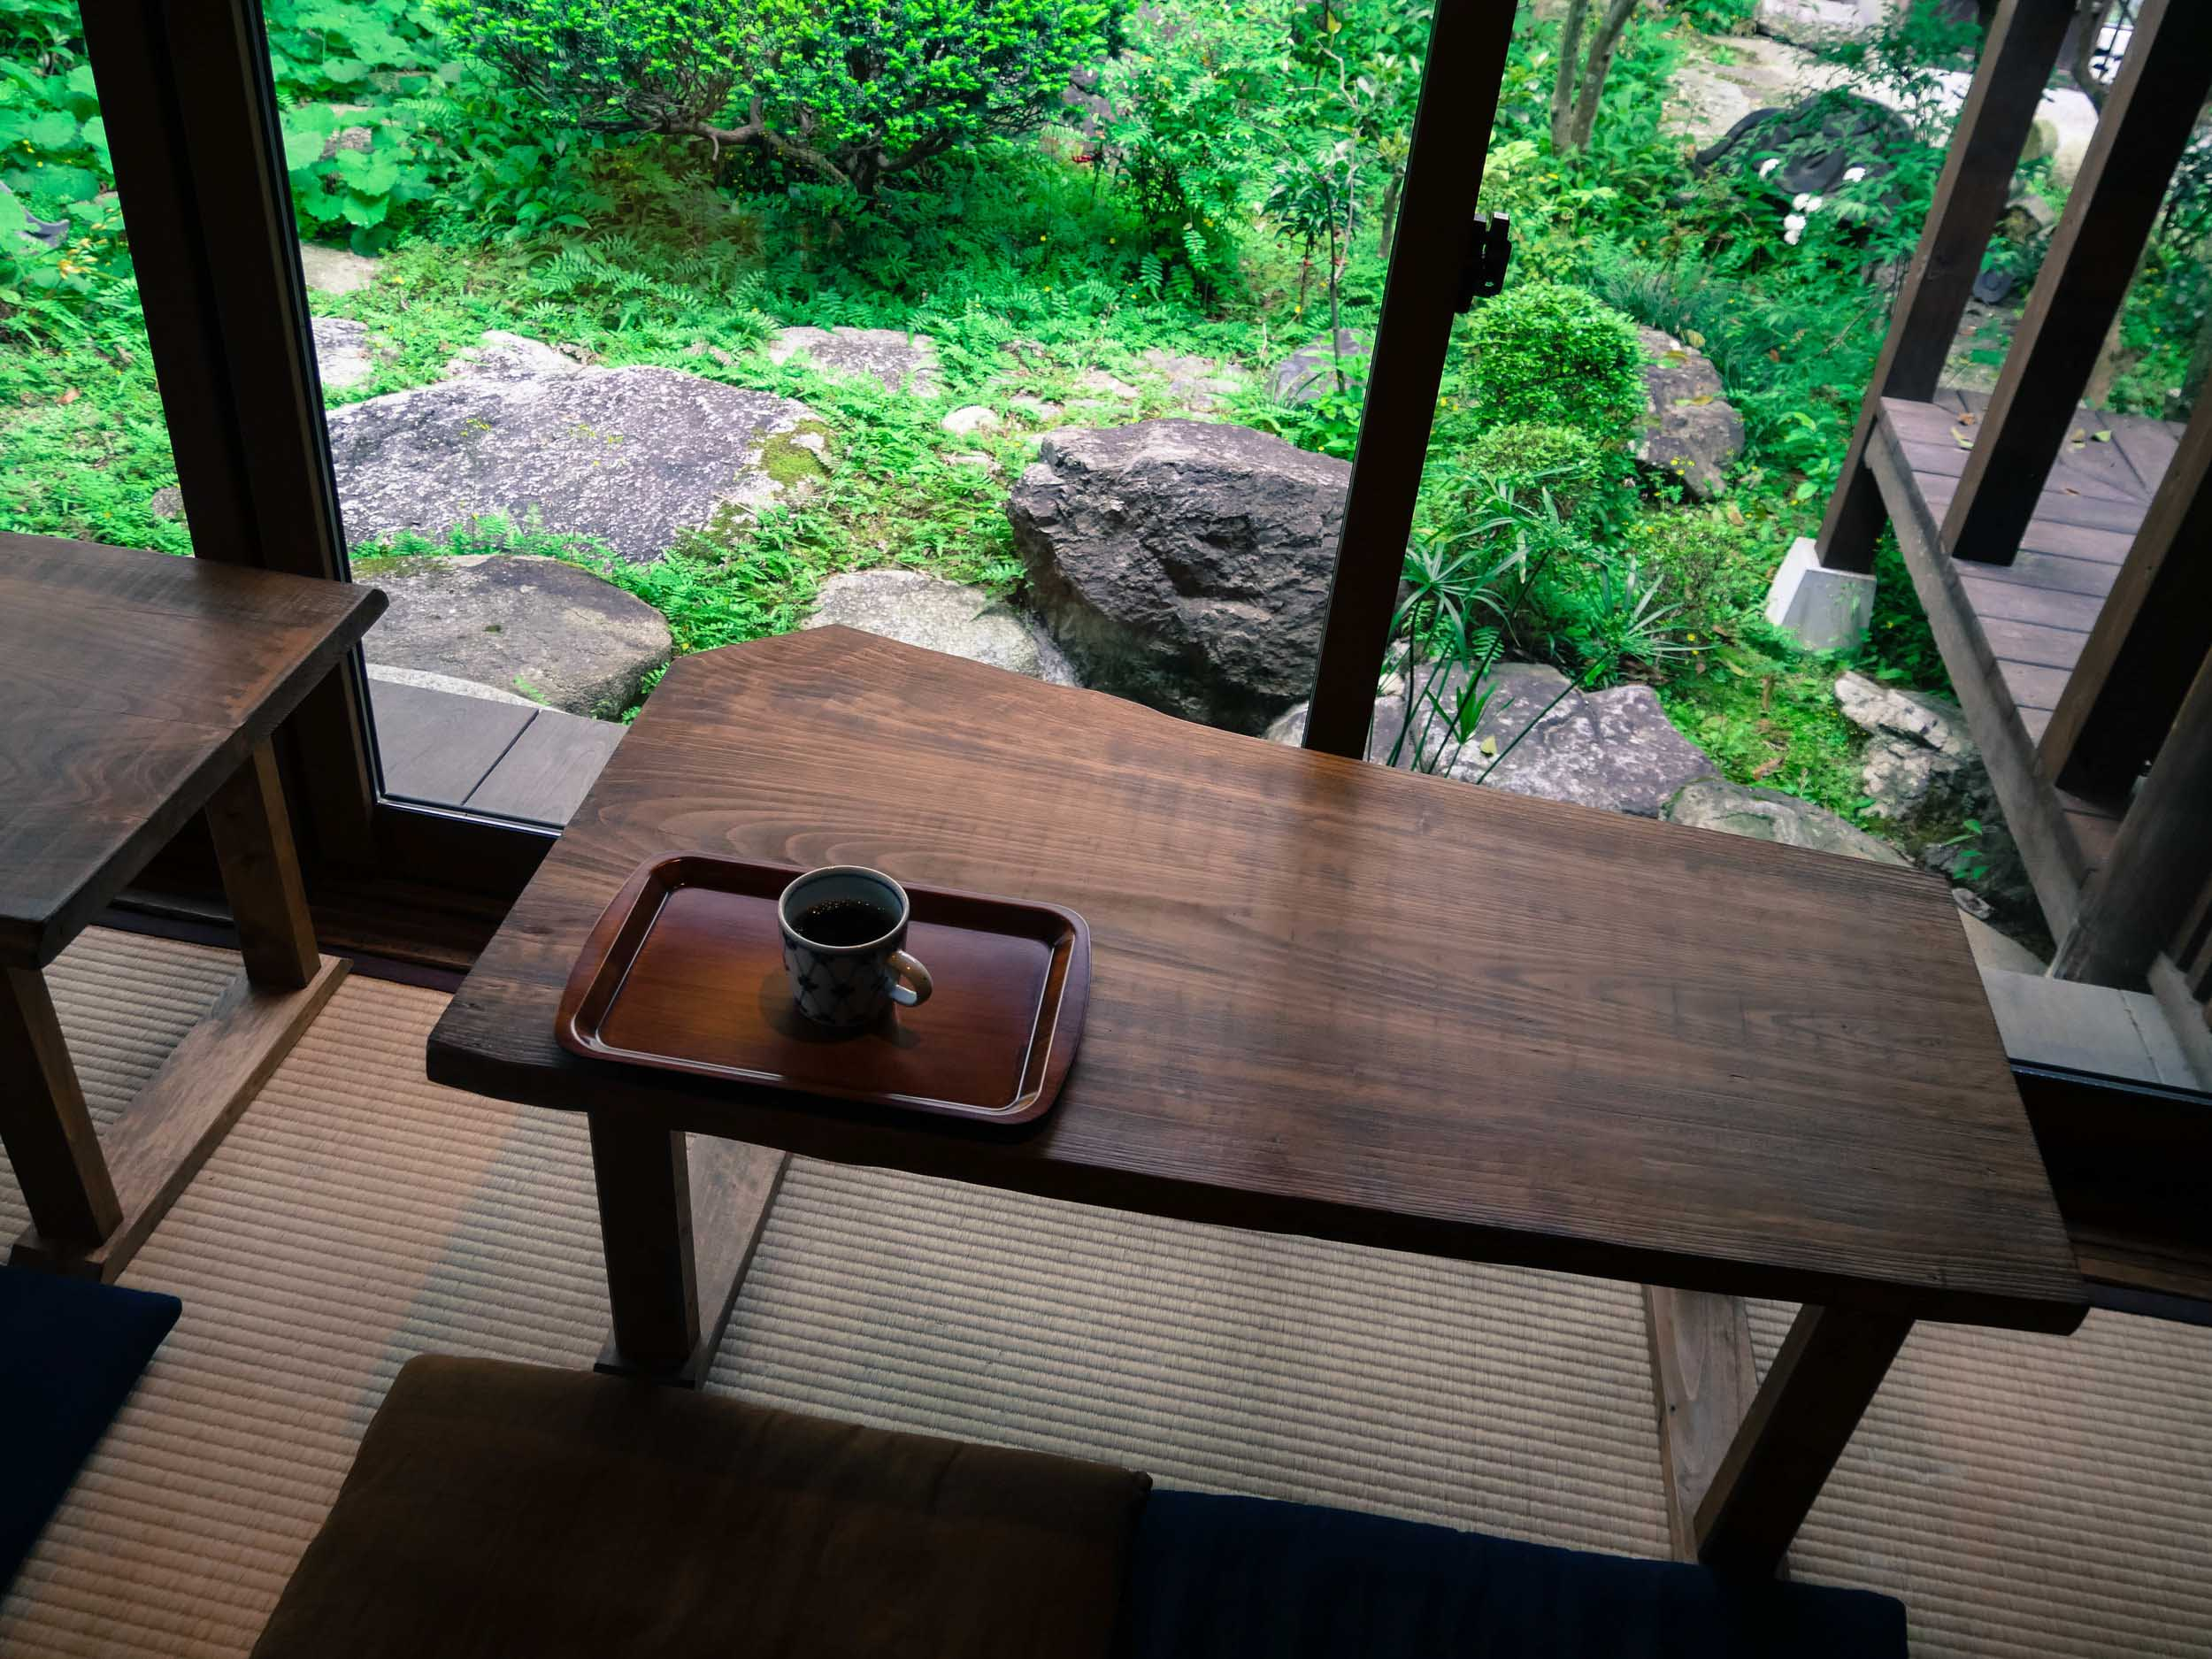 matsuyama-dougo-onsen-63.jpg